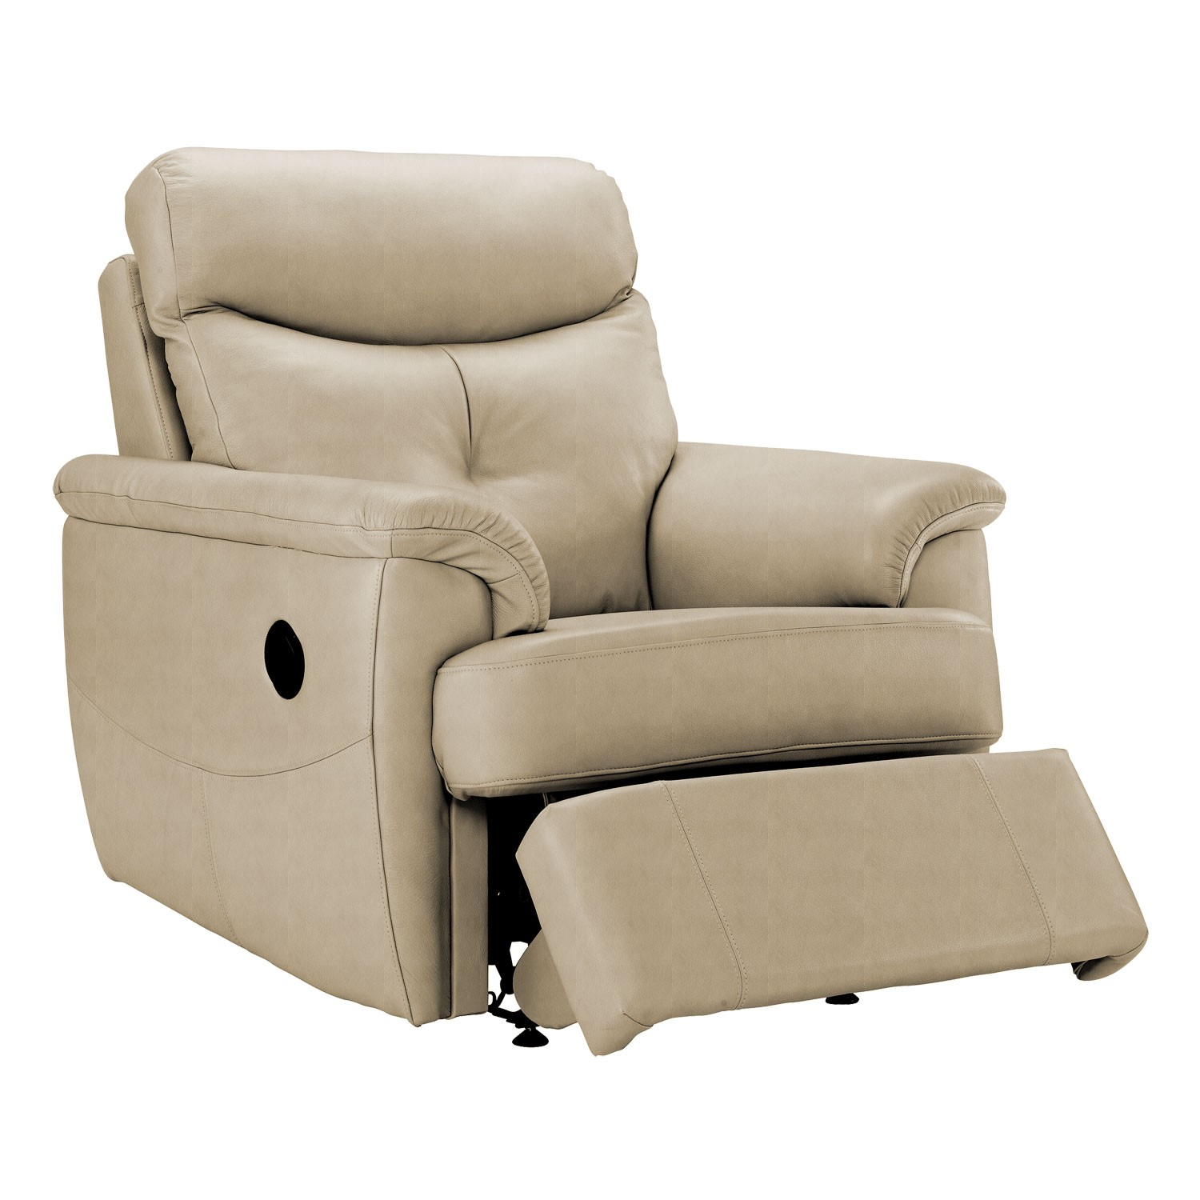 atlanta recliner chair graco blossom high g plan manual leekes